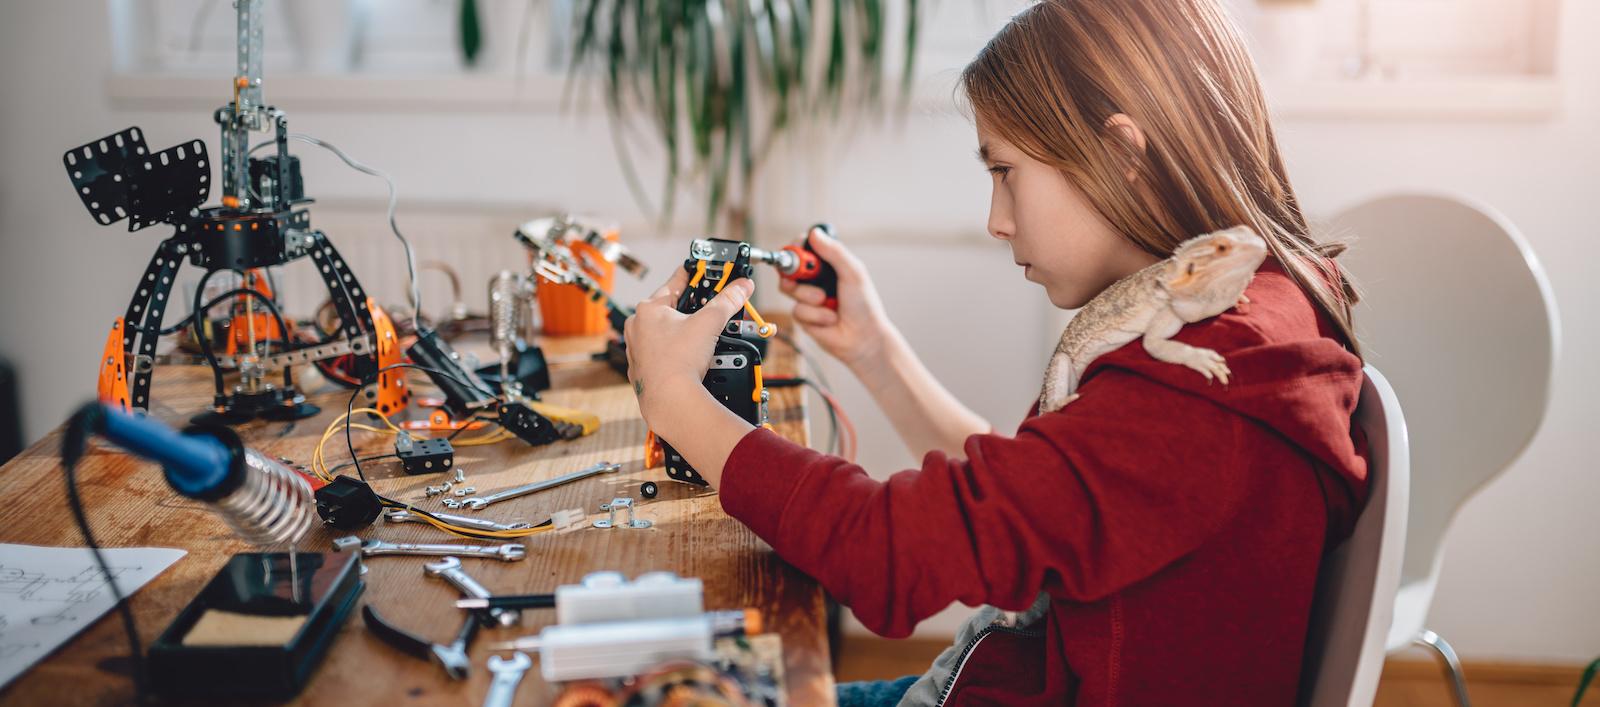 Girl building robot